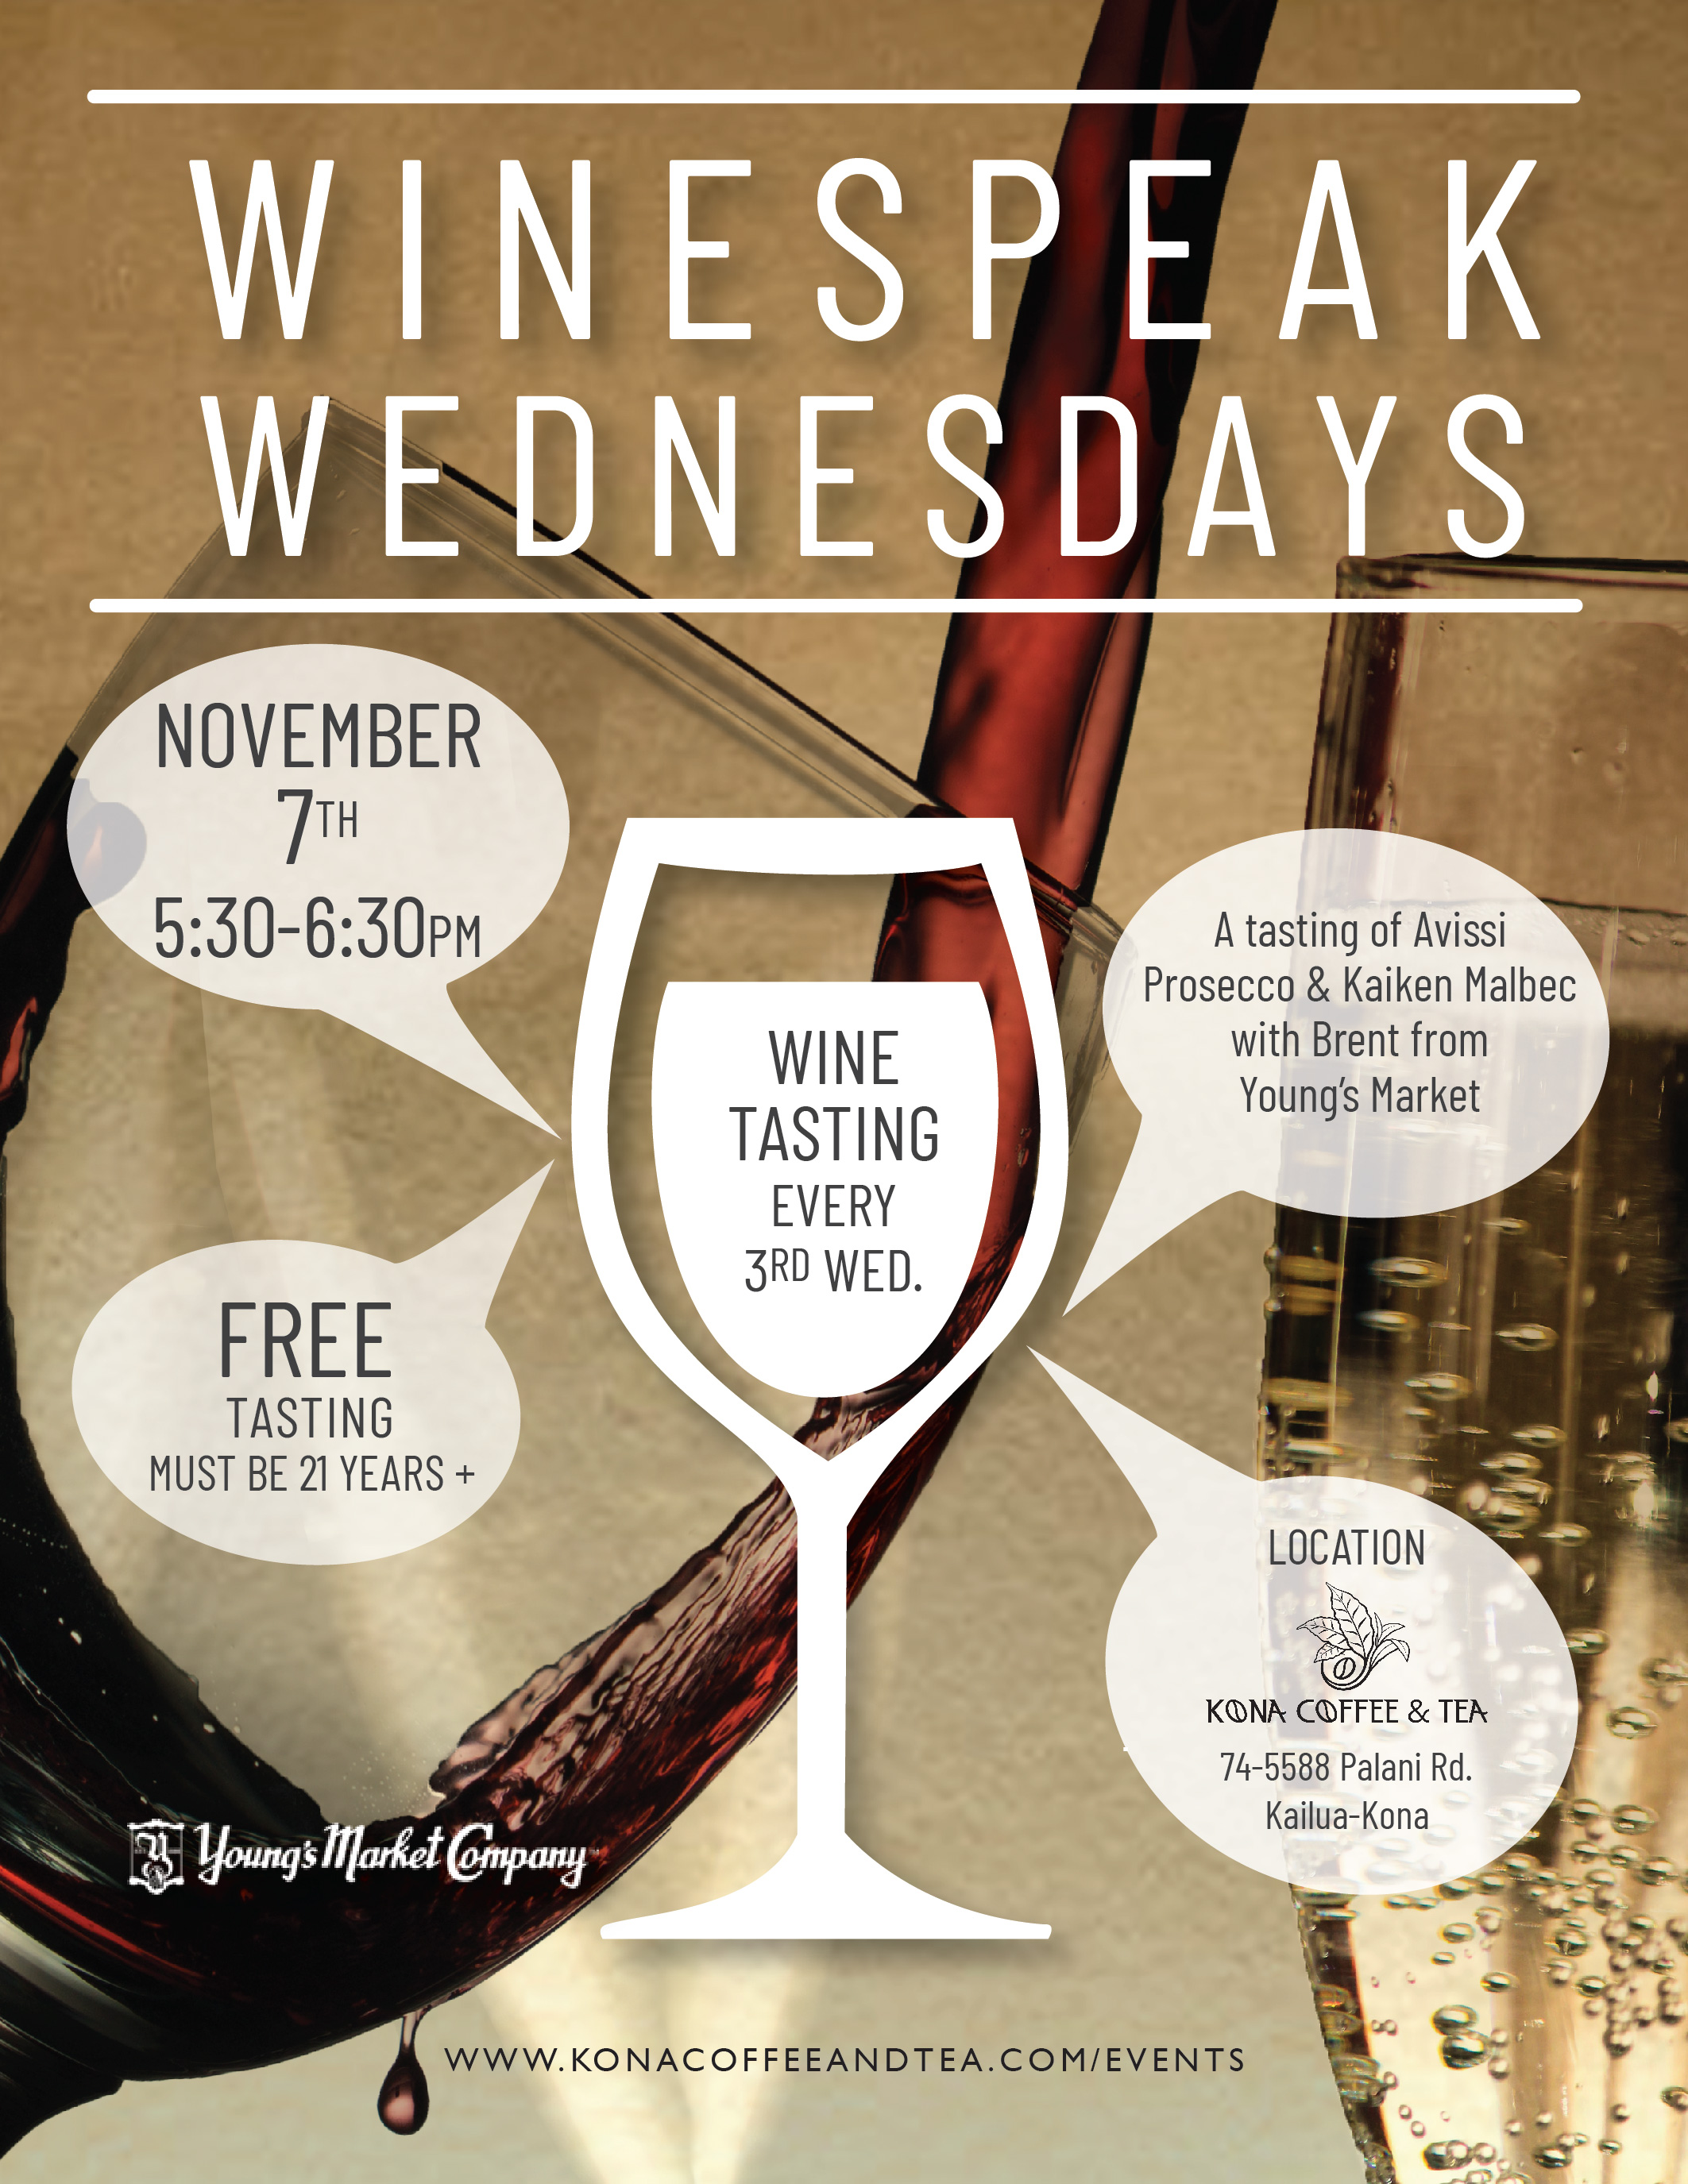 WineSpeak Wednesdays_11.7.18_KCTC 11x17 poster-01.jpg